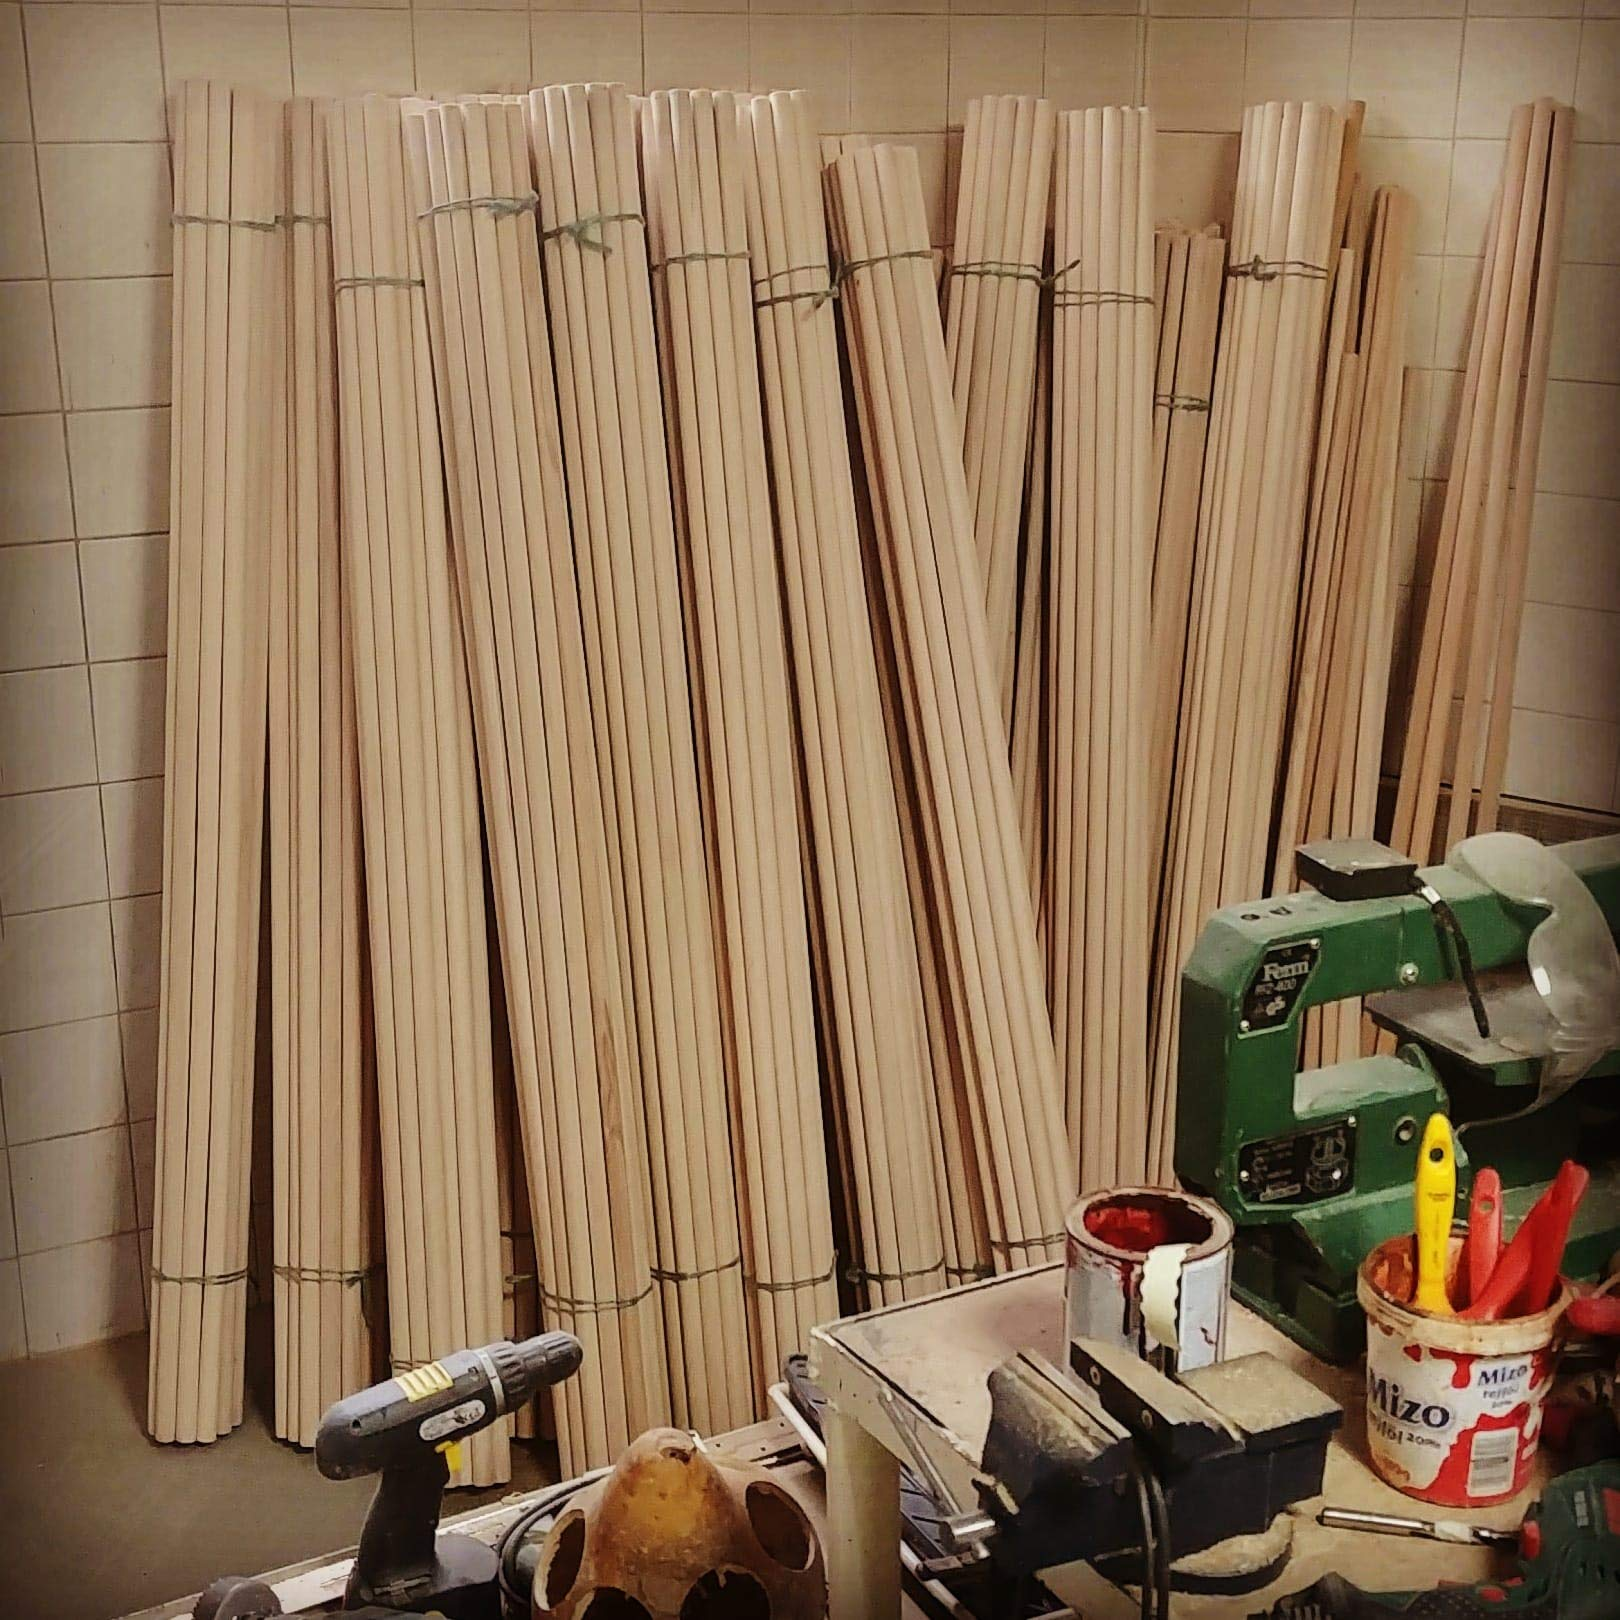 Verga raw material DIY Pack 10x pcs - Small Size 140 cm